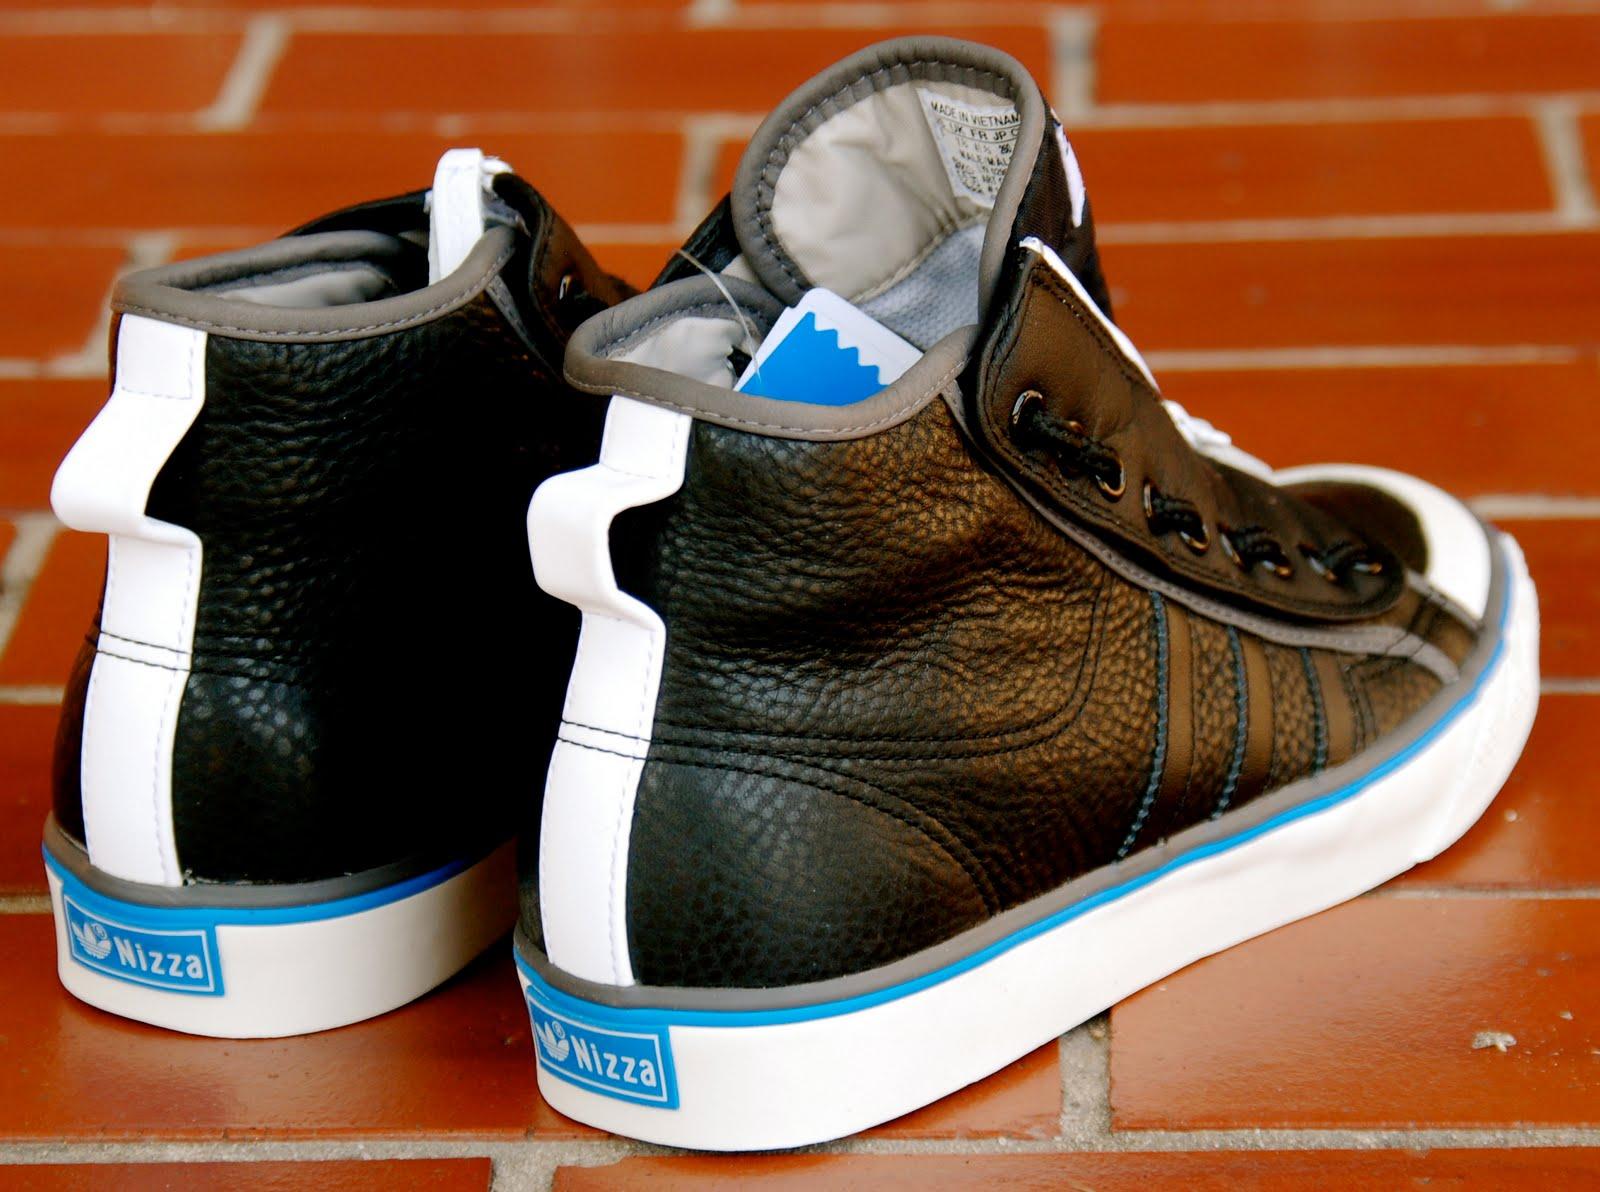 Sole Sneaker Boutique: Sneaker Adidas Nizza Sole Hi Nizza OT Tech cb990fc - generiskmedicin.website